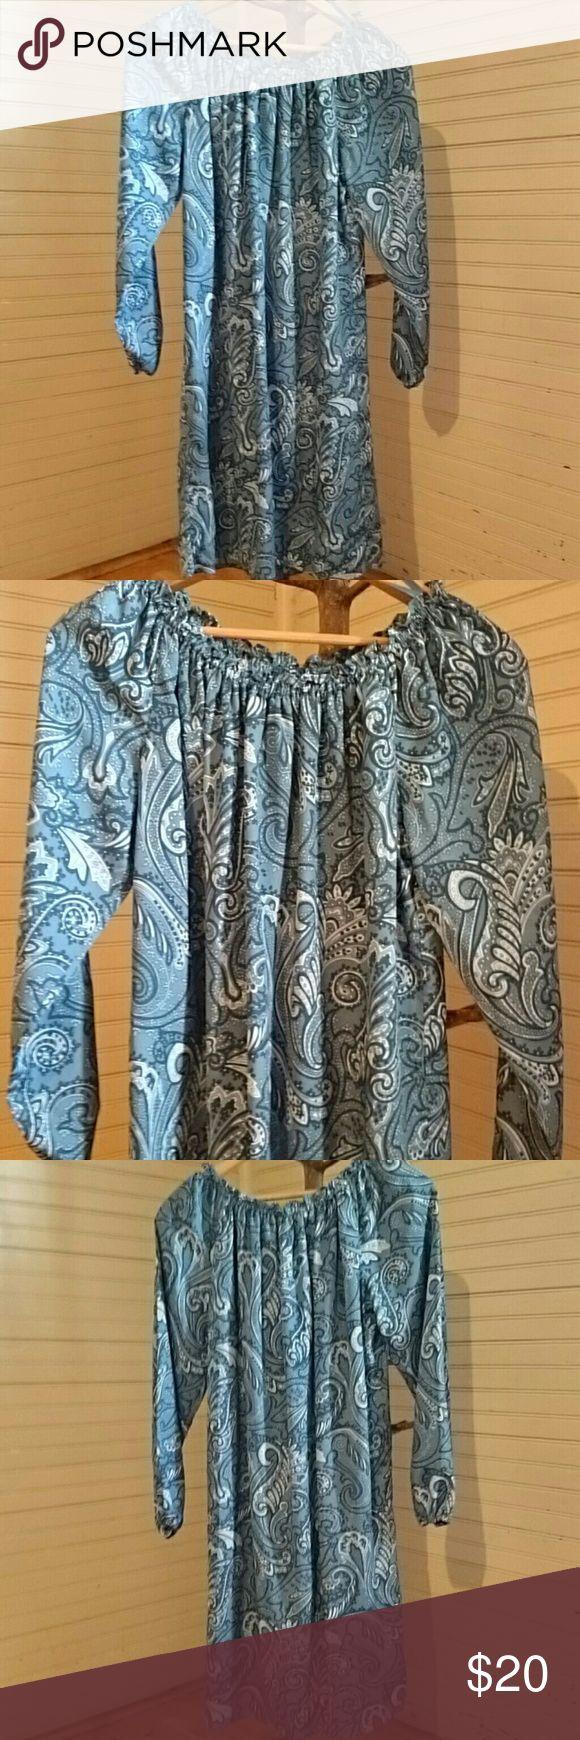 MICHAEL Michael Kors Paisley dress Great condition... Slip attached underneath MICHAEL Michael Kors Dresses Midi